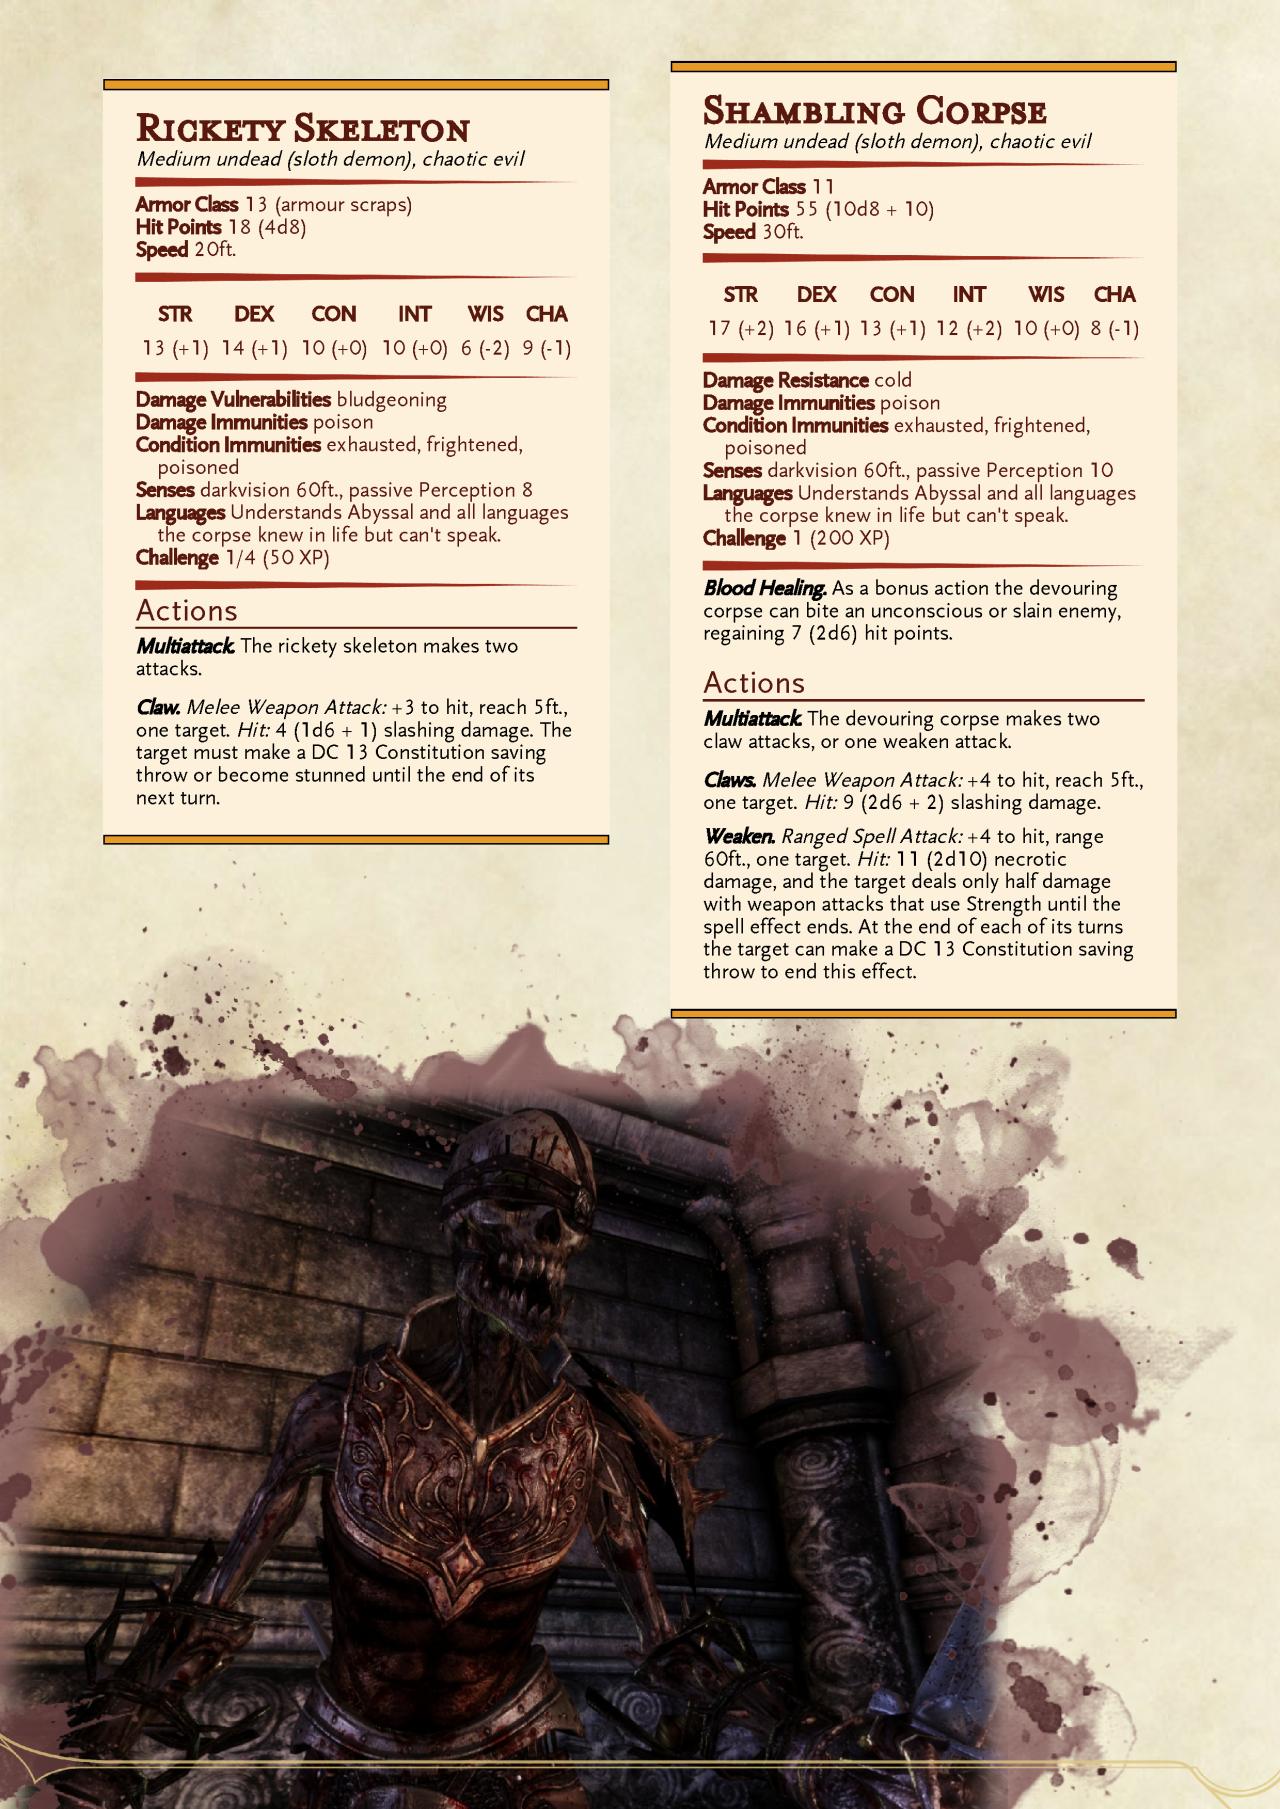 DnD 5e Homebrew — Dragon Age Demons Part 3 by Emmetation